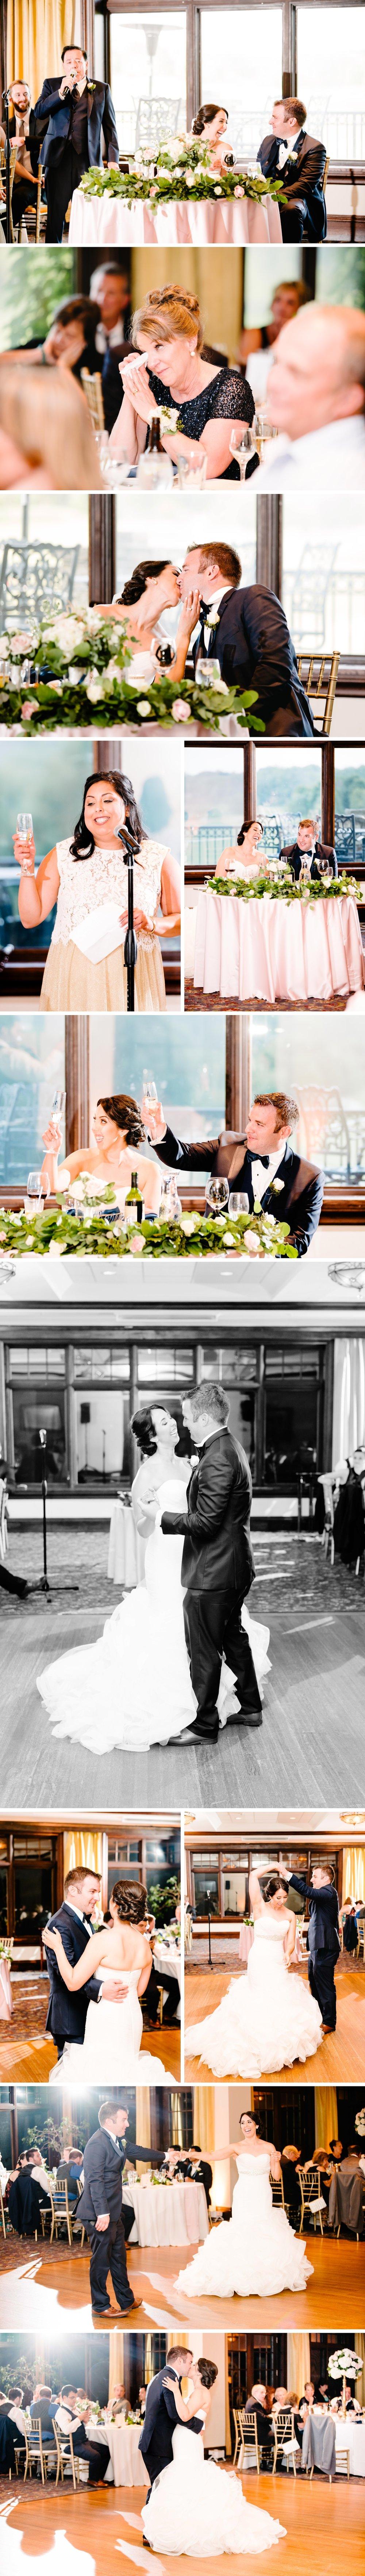 chicago-fine-art-wedding-photography-burdi9